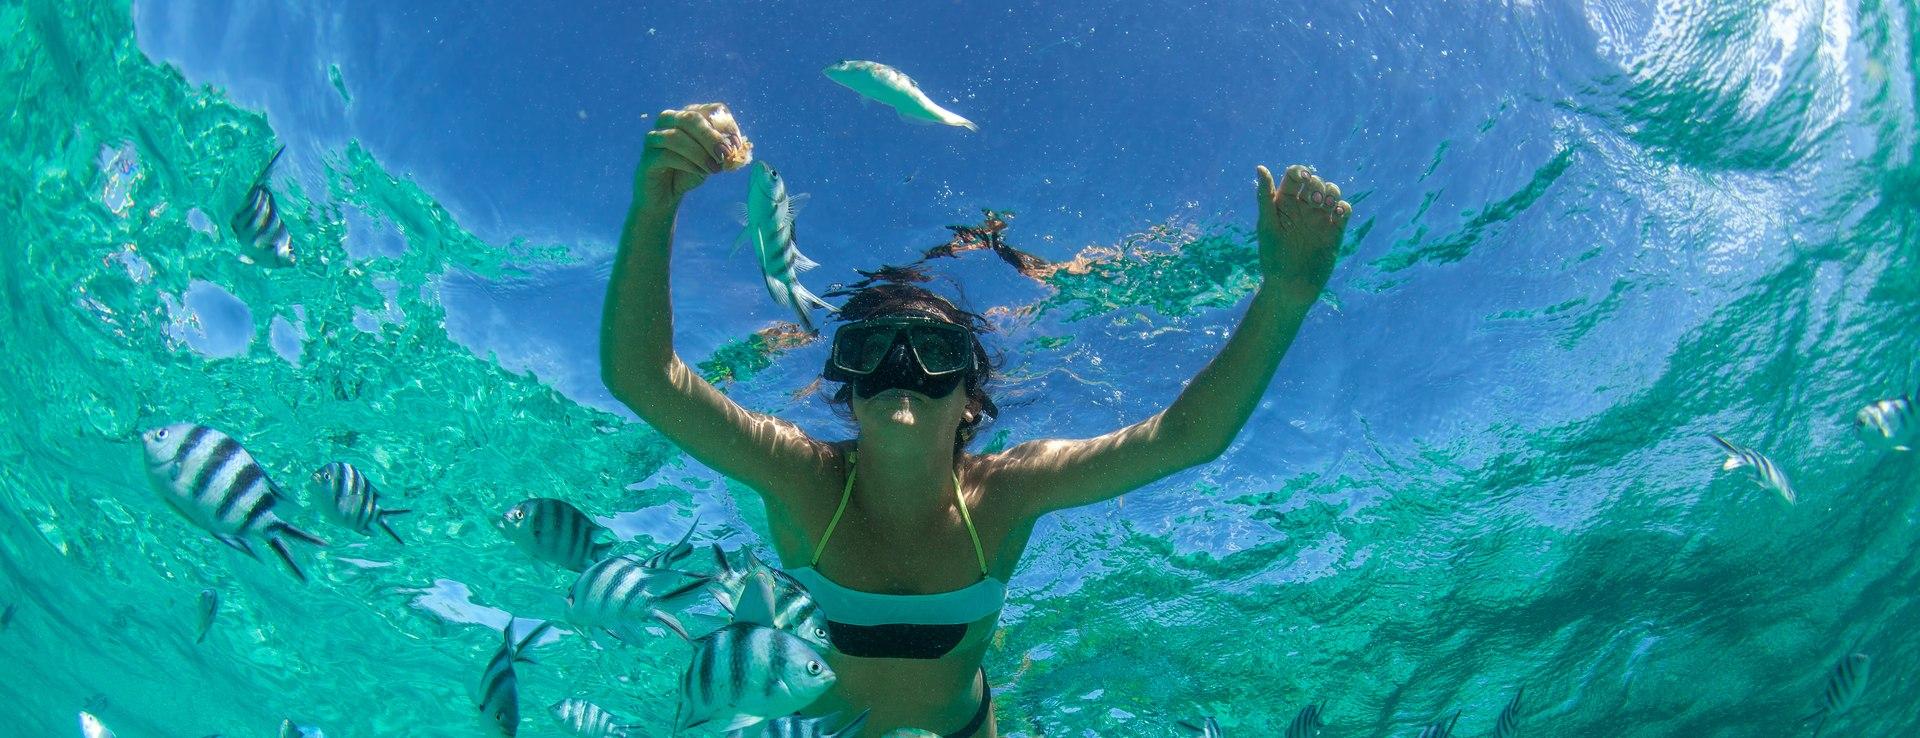 Private Reef Snorkeling Image 1